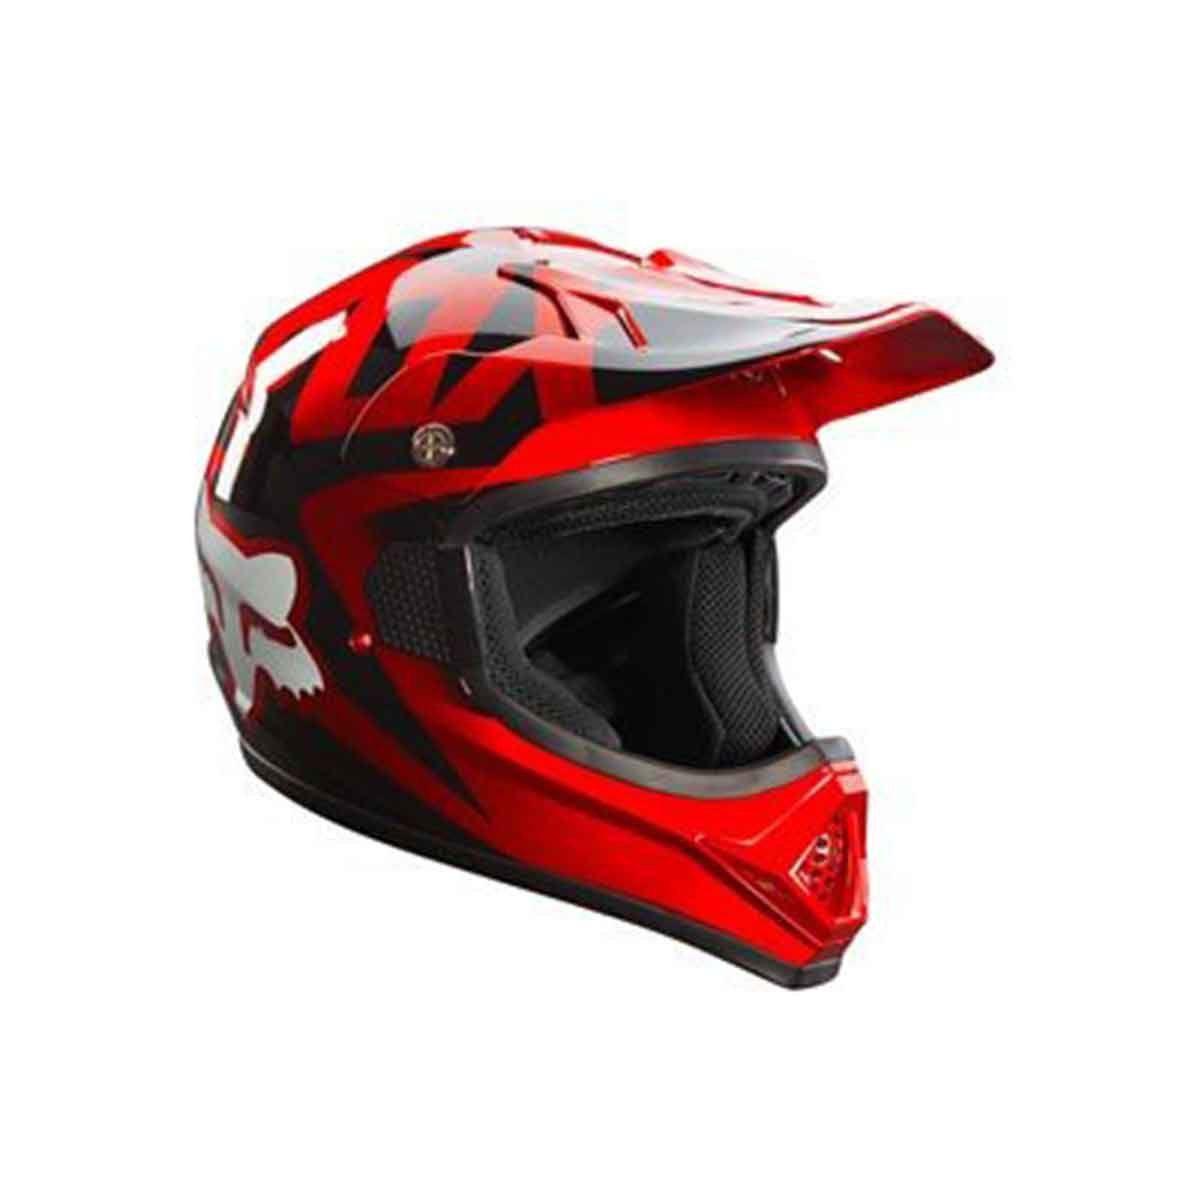 Capacete de Motocross Fox VF1 Solid Red